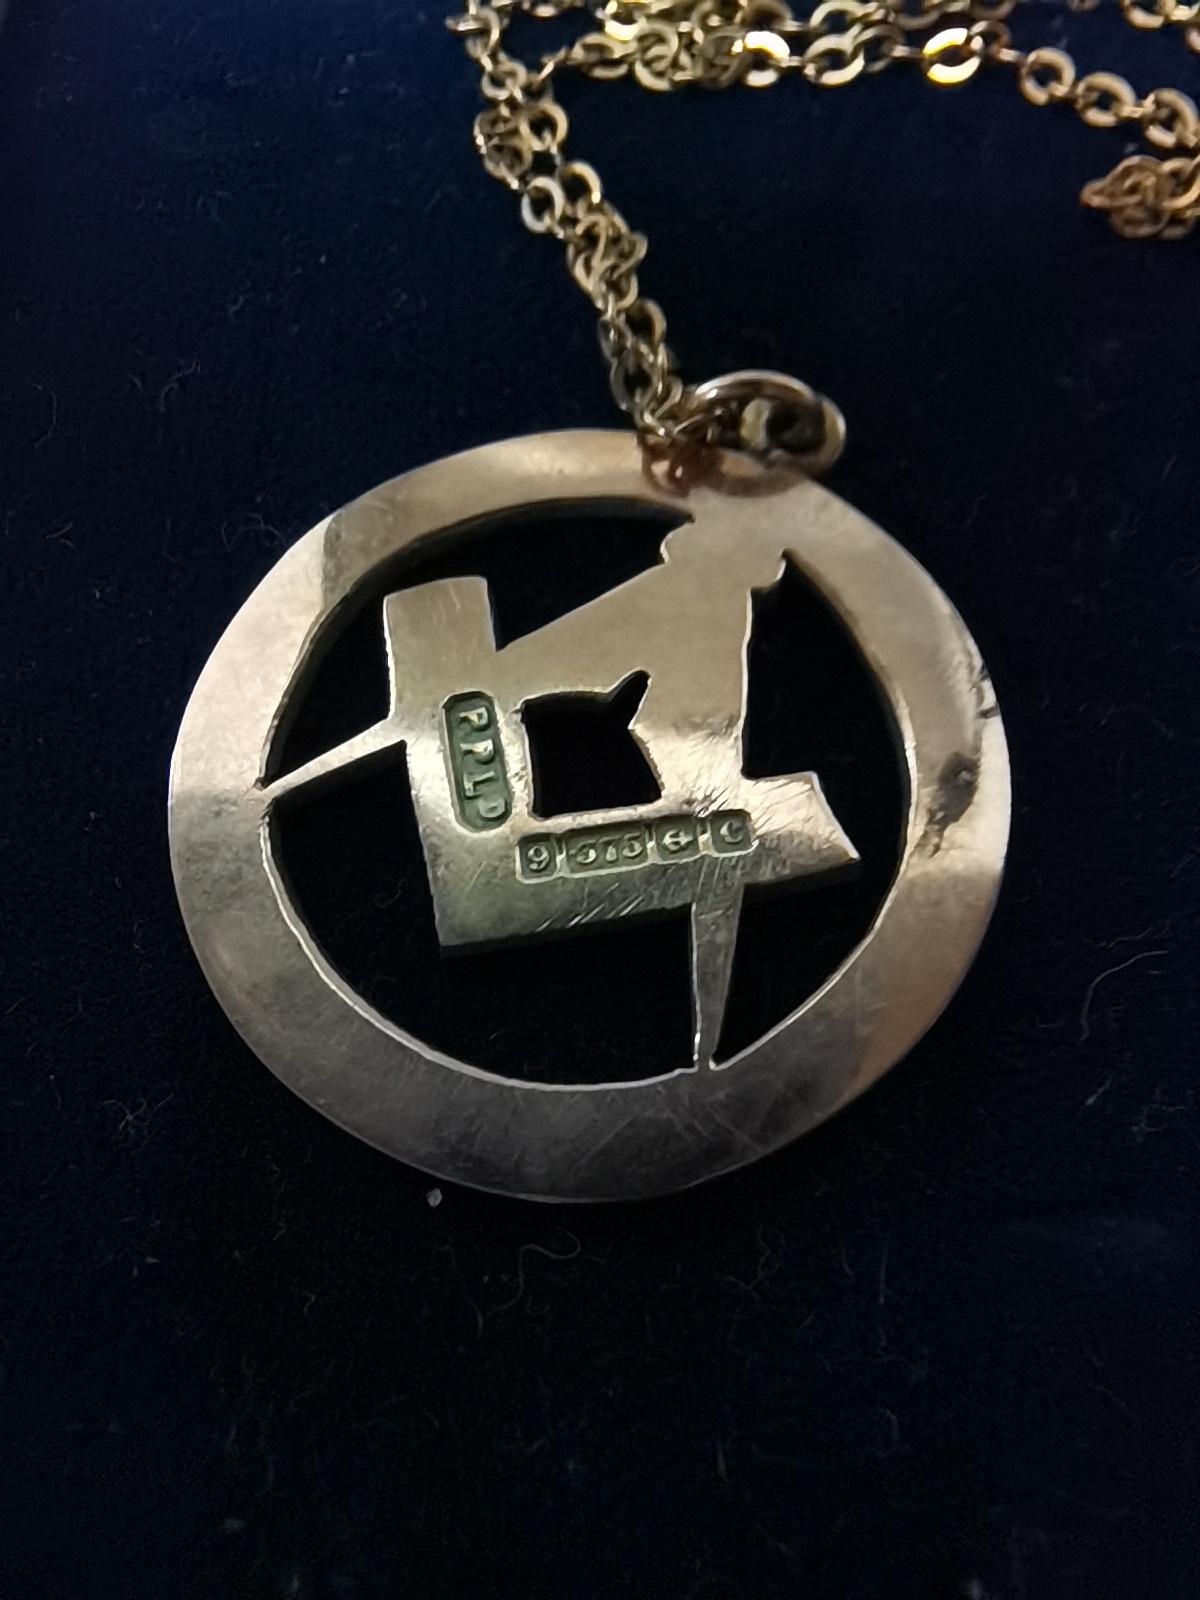 Gold masonic pendant on chain 5g - Image 2 of 2